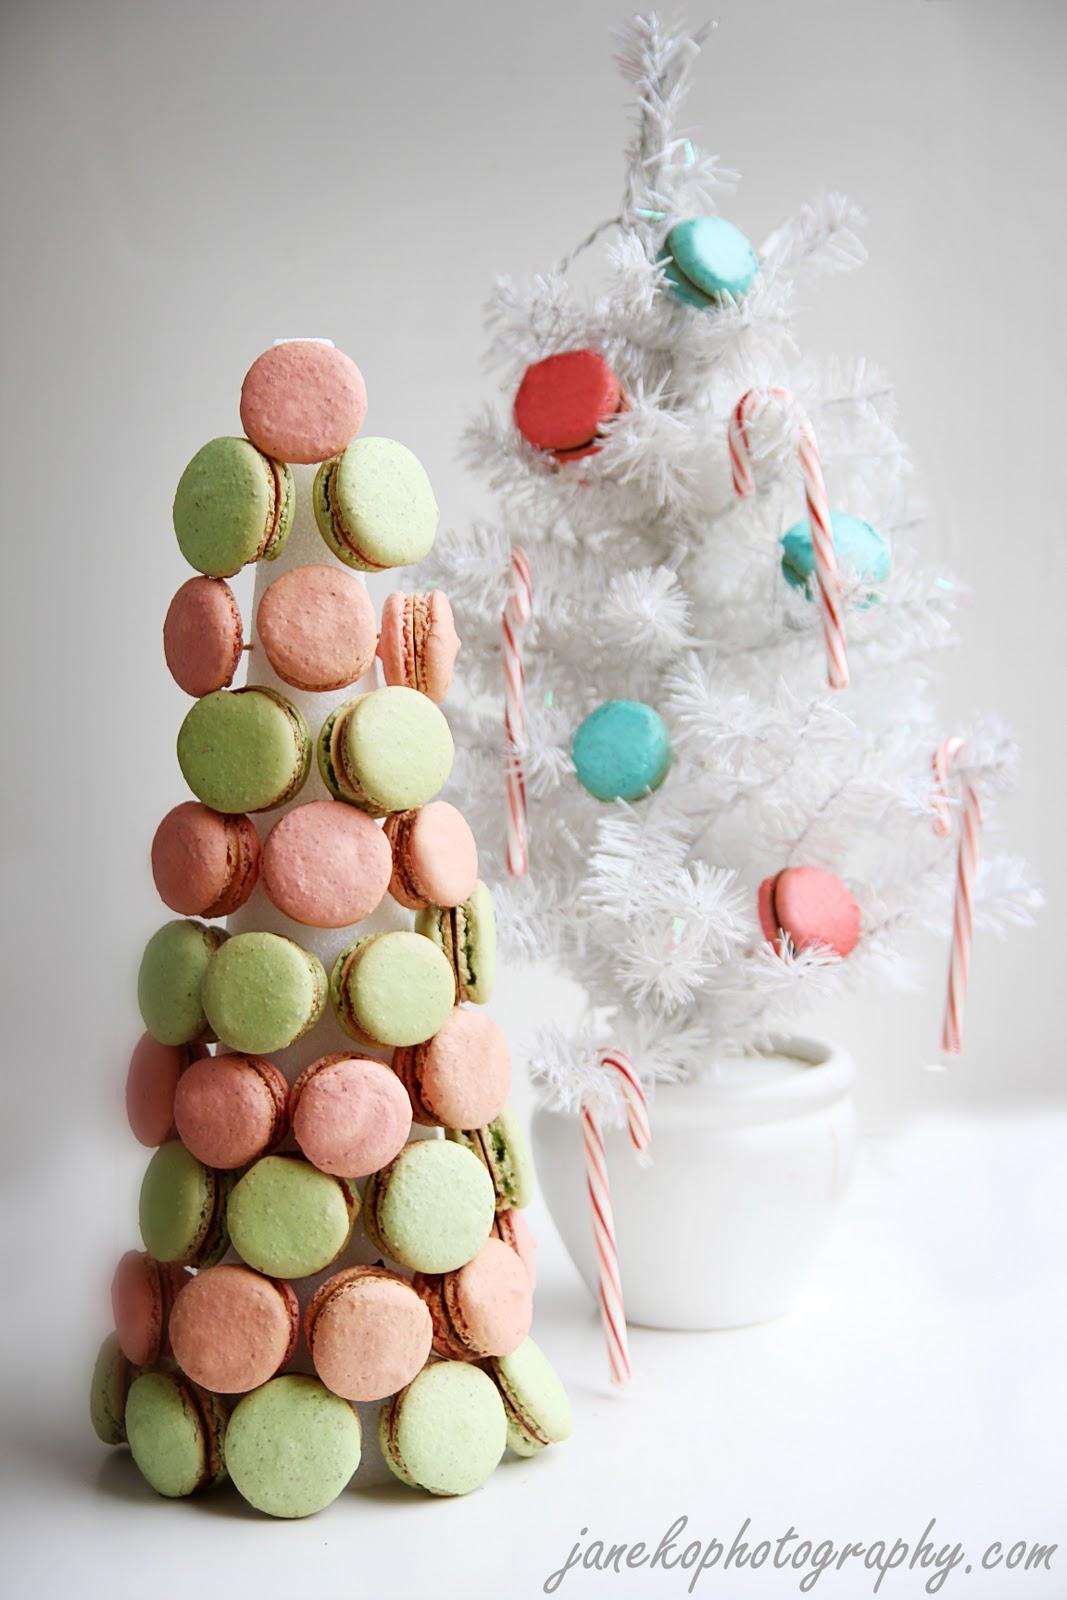 Christmas Calendar Chocolate : Macaron christmas tree a taste of koko austin s top